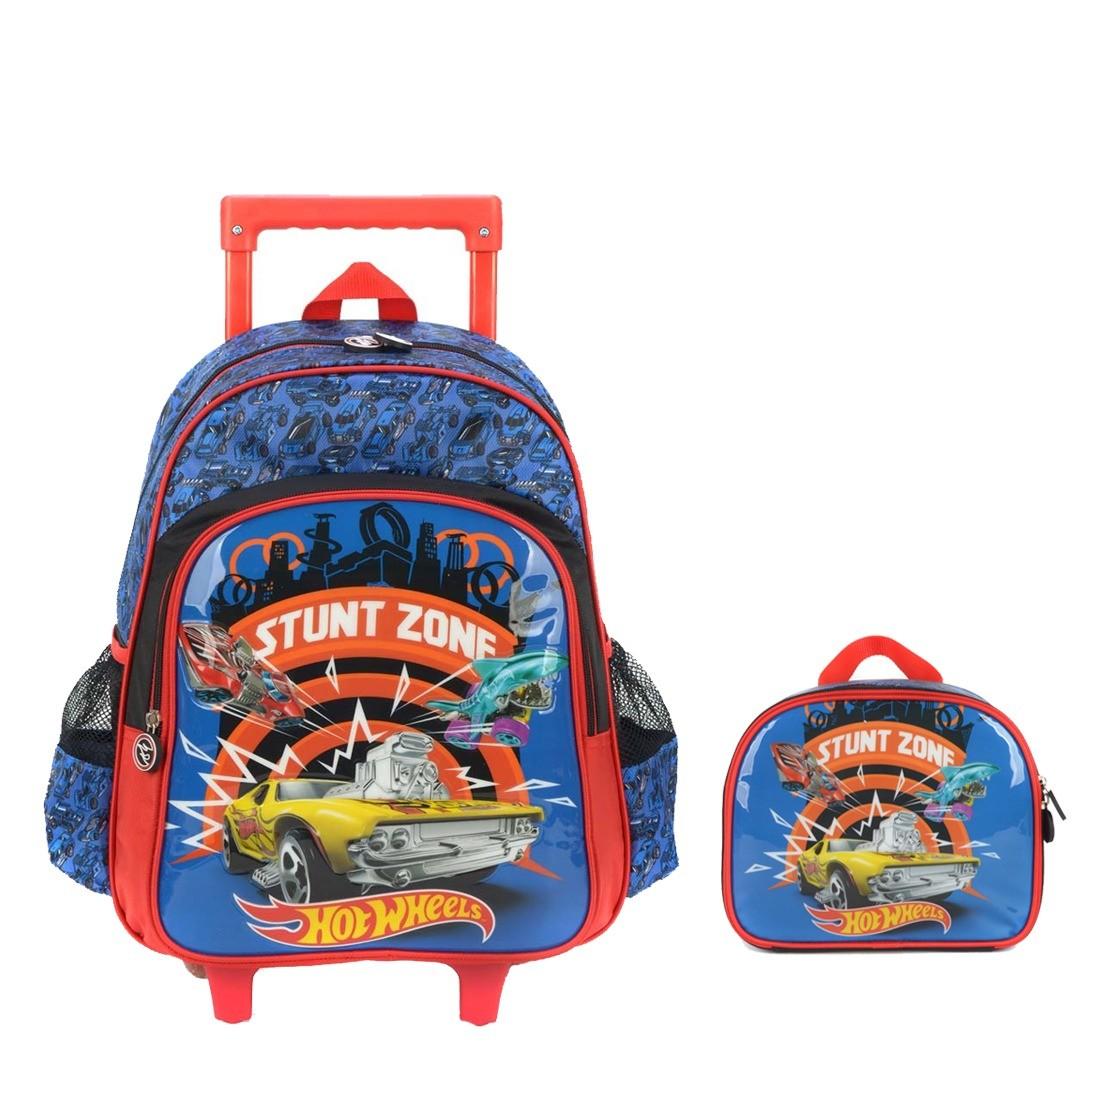 Kit Mochila Infantil com Rodinhas Hot Wheels E Lancheira